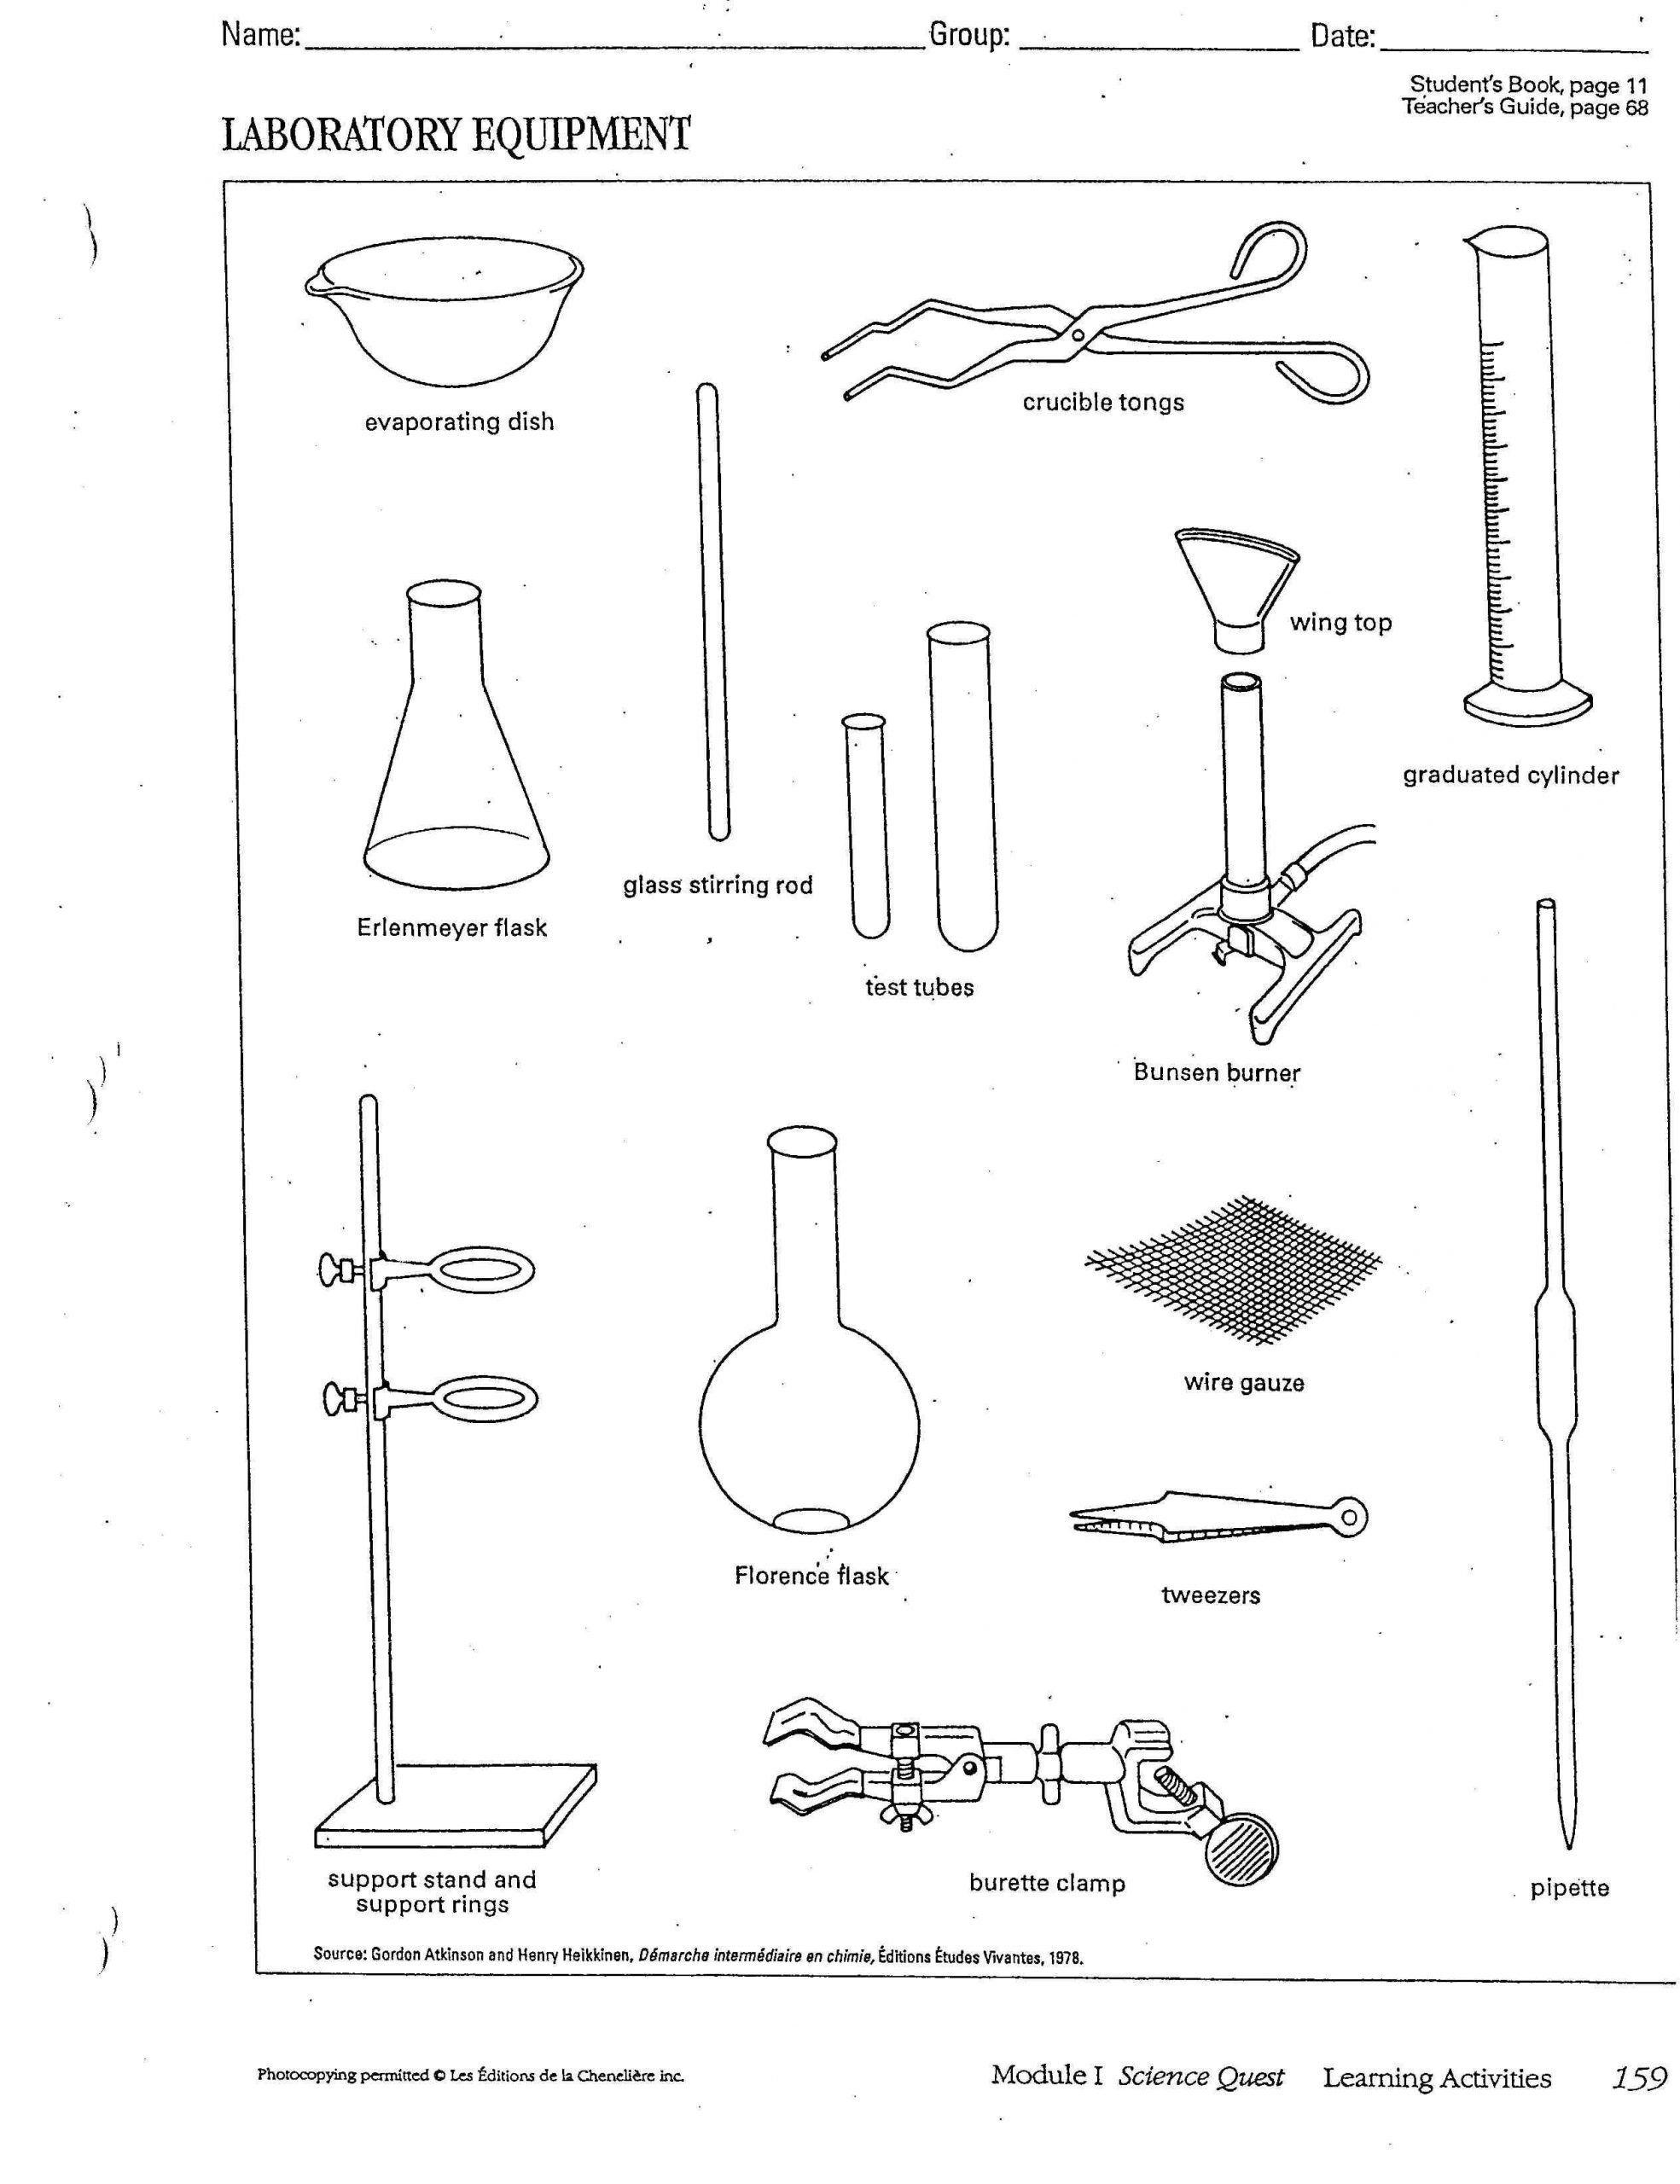 Lab Equipment Worksheet Answer Key Chemistry Lab Equipment